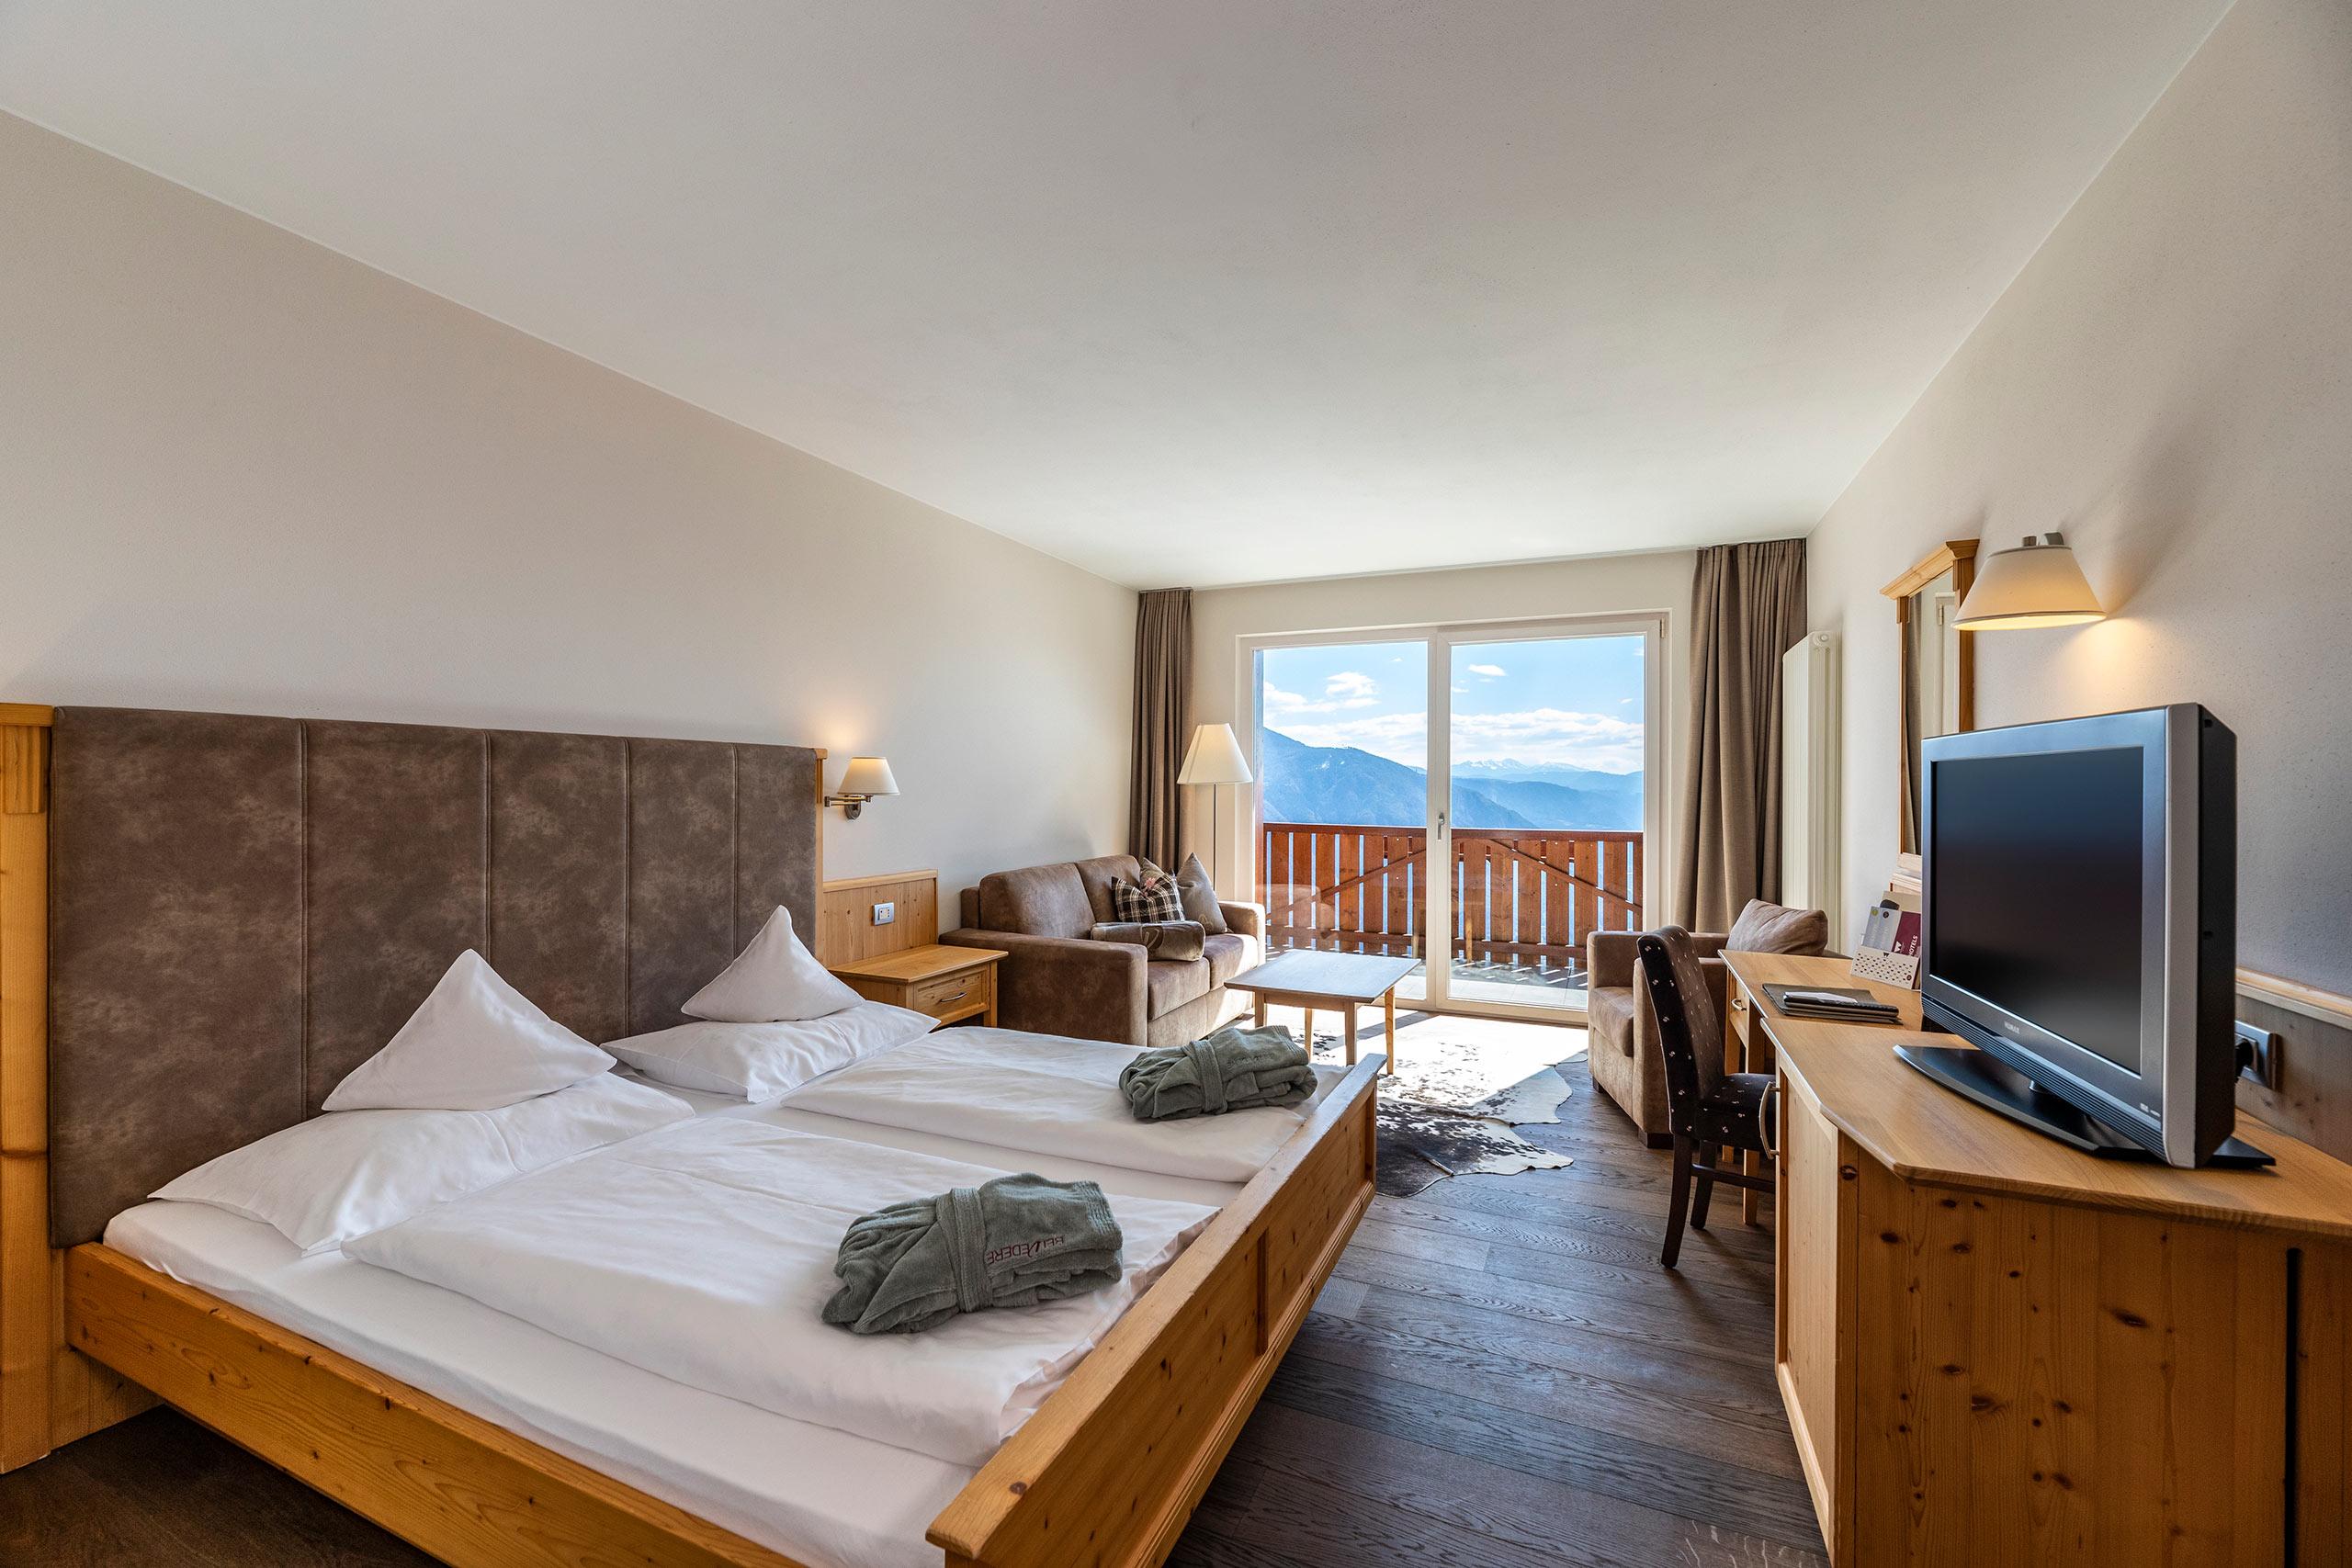 hotel_belvedere_jenesien_referenz_05